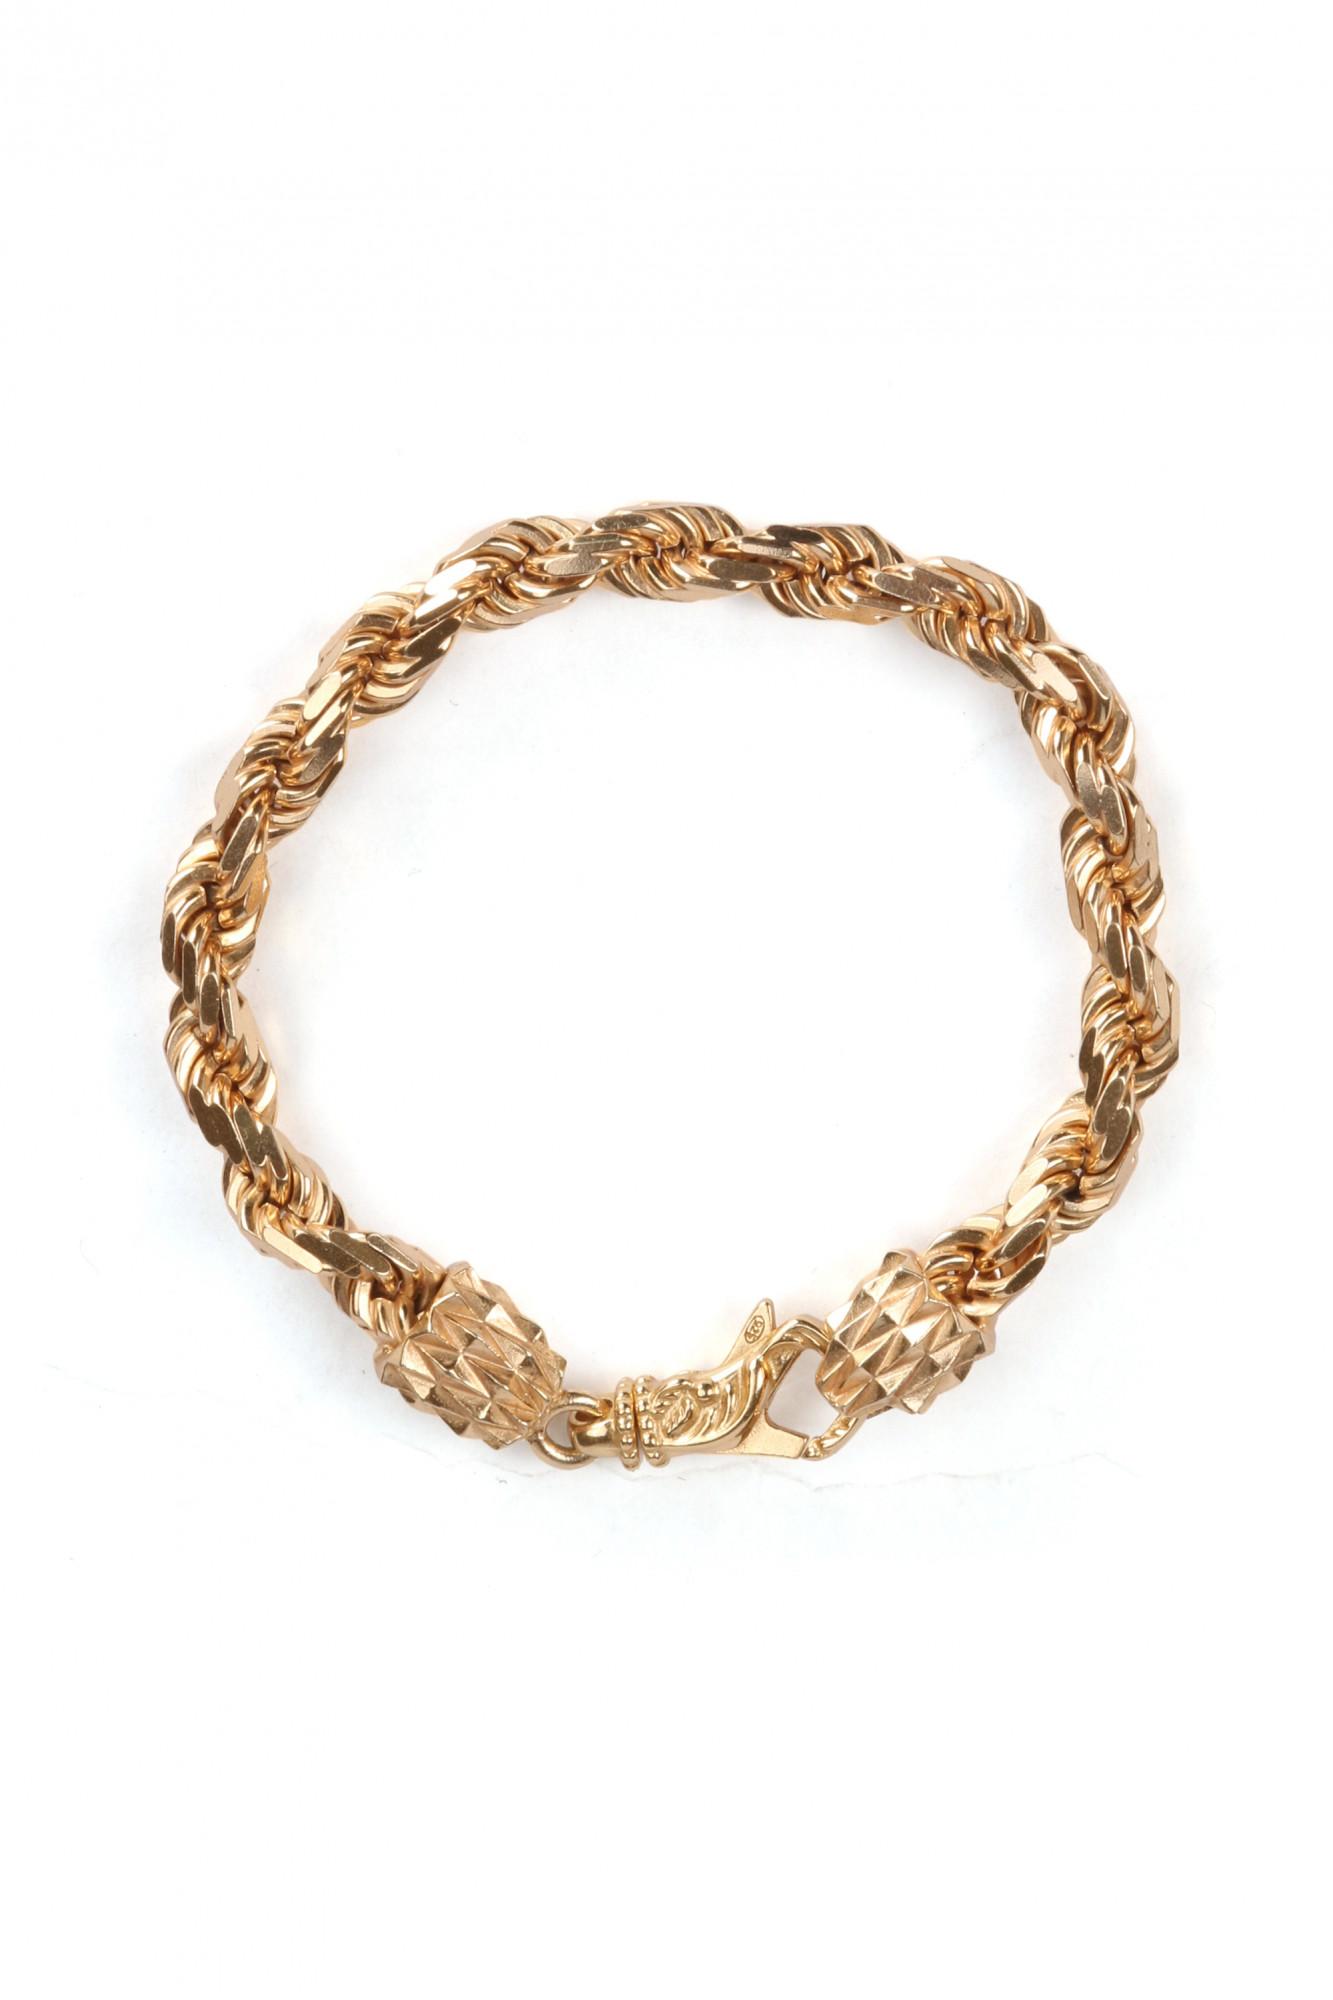 EB French Rope Gold Bracelet